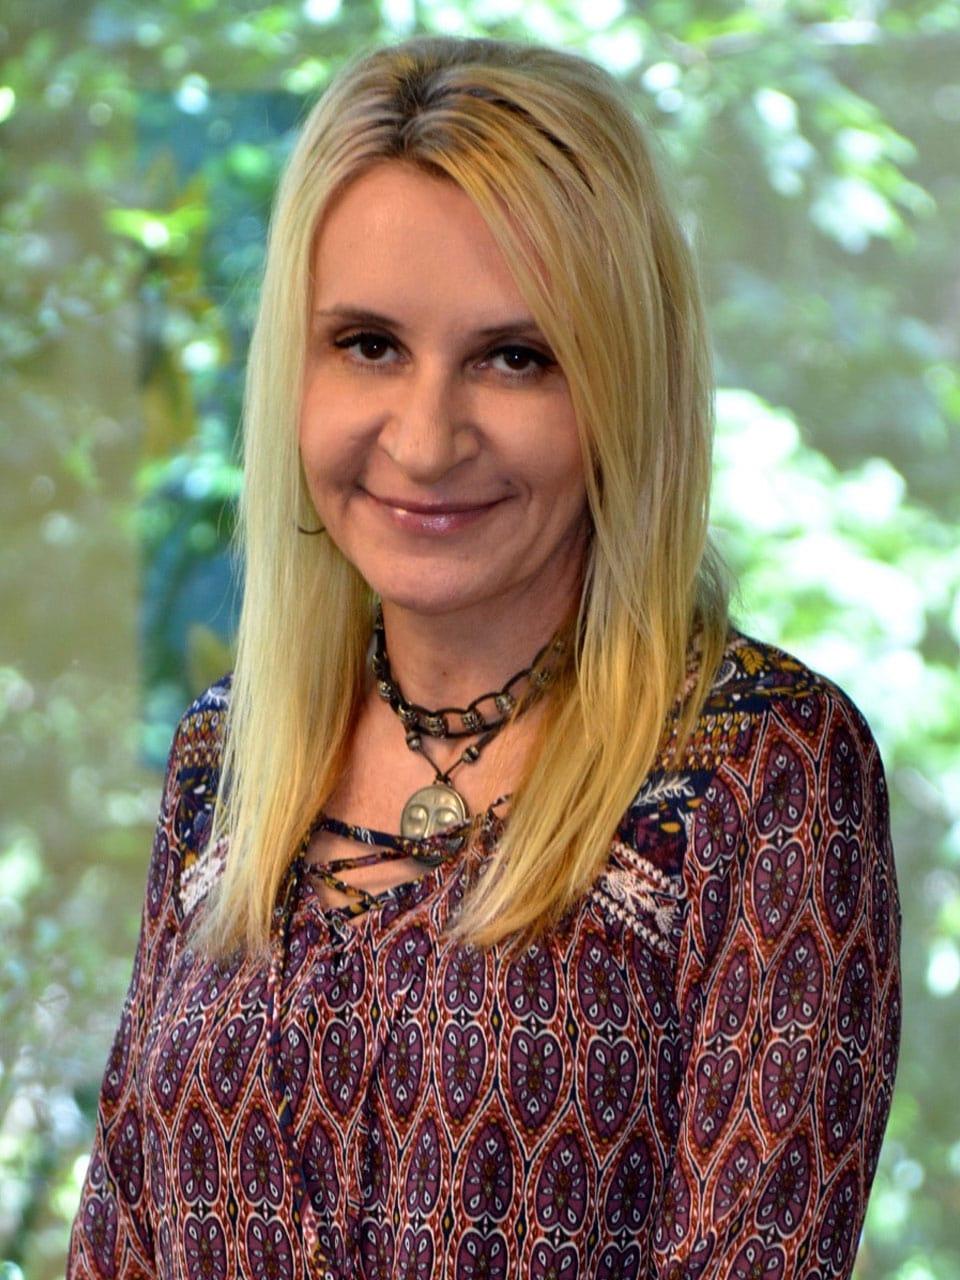 Stacie Beaujeaux